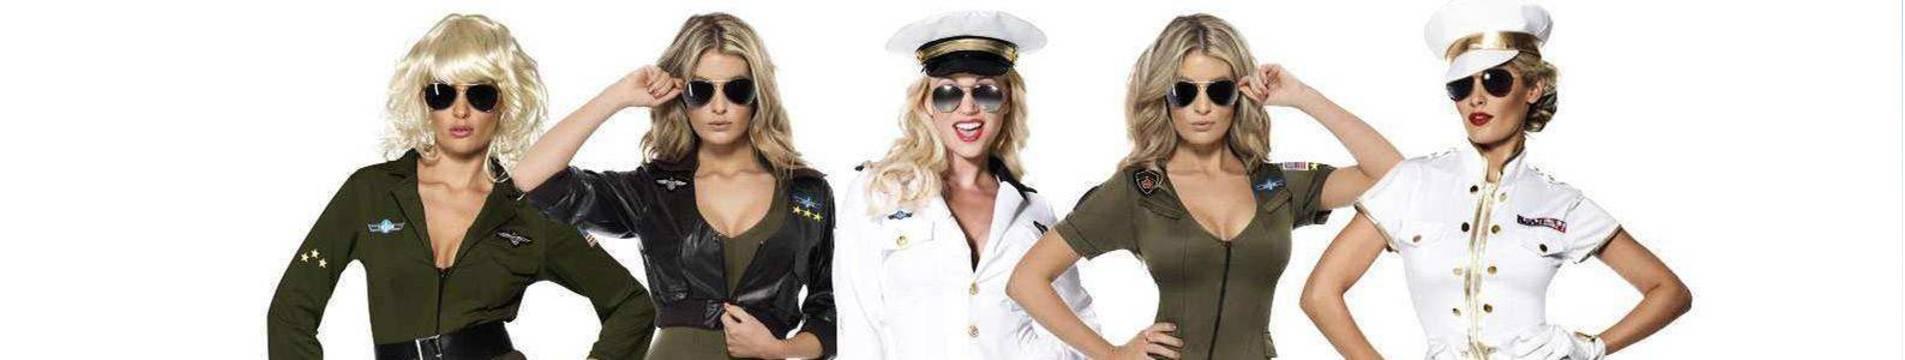 army-fancy-dress.jpg